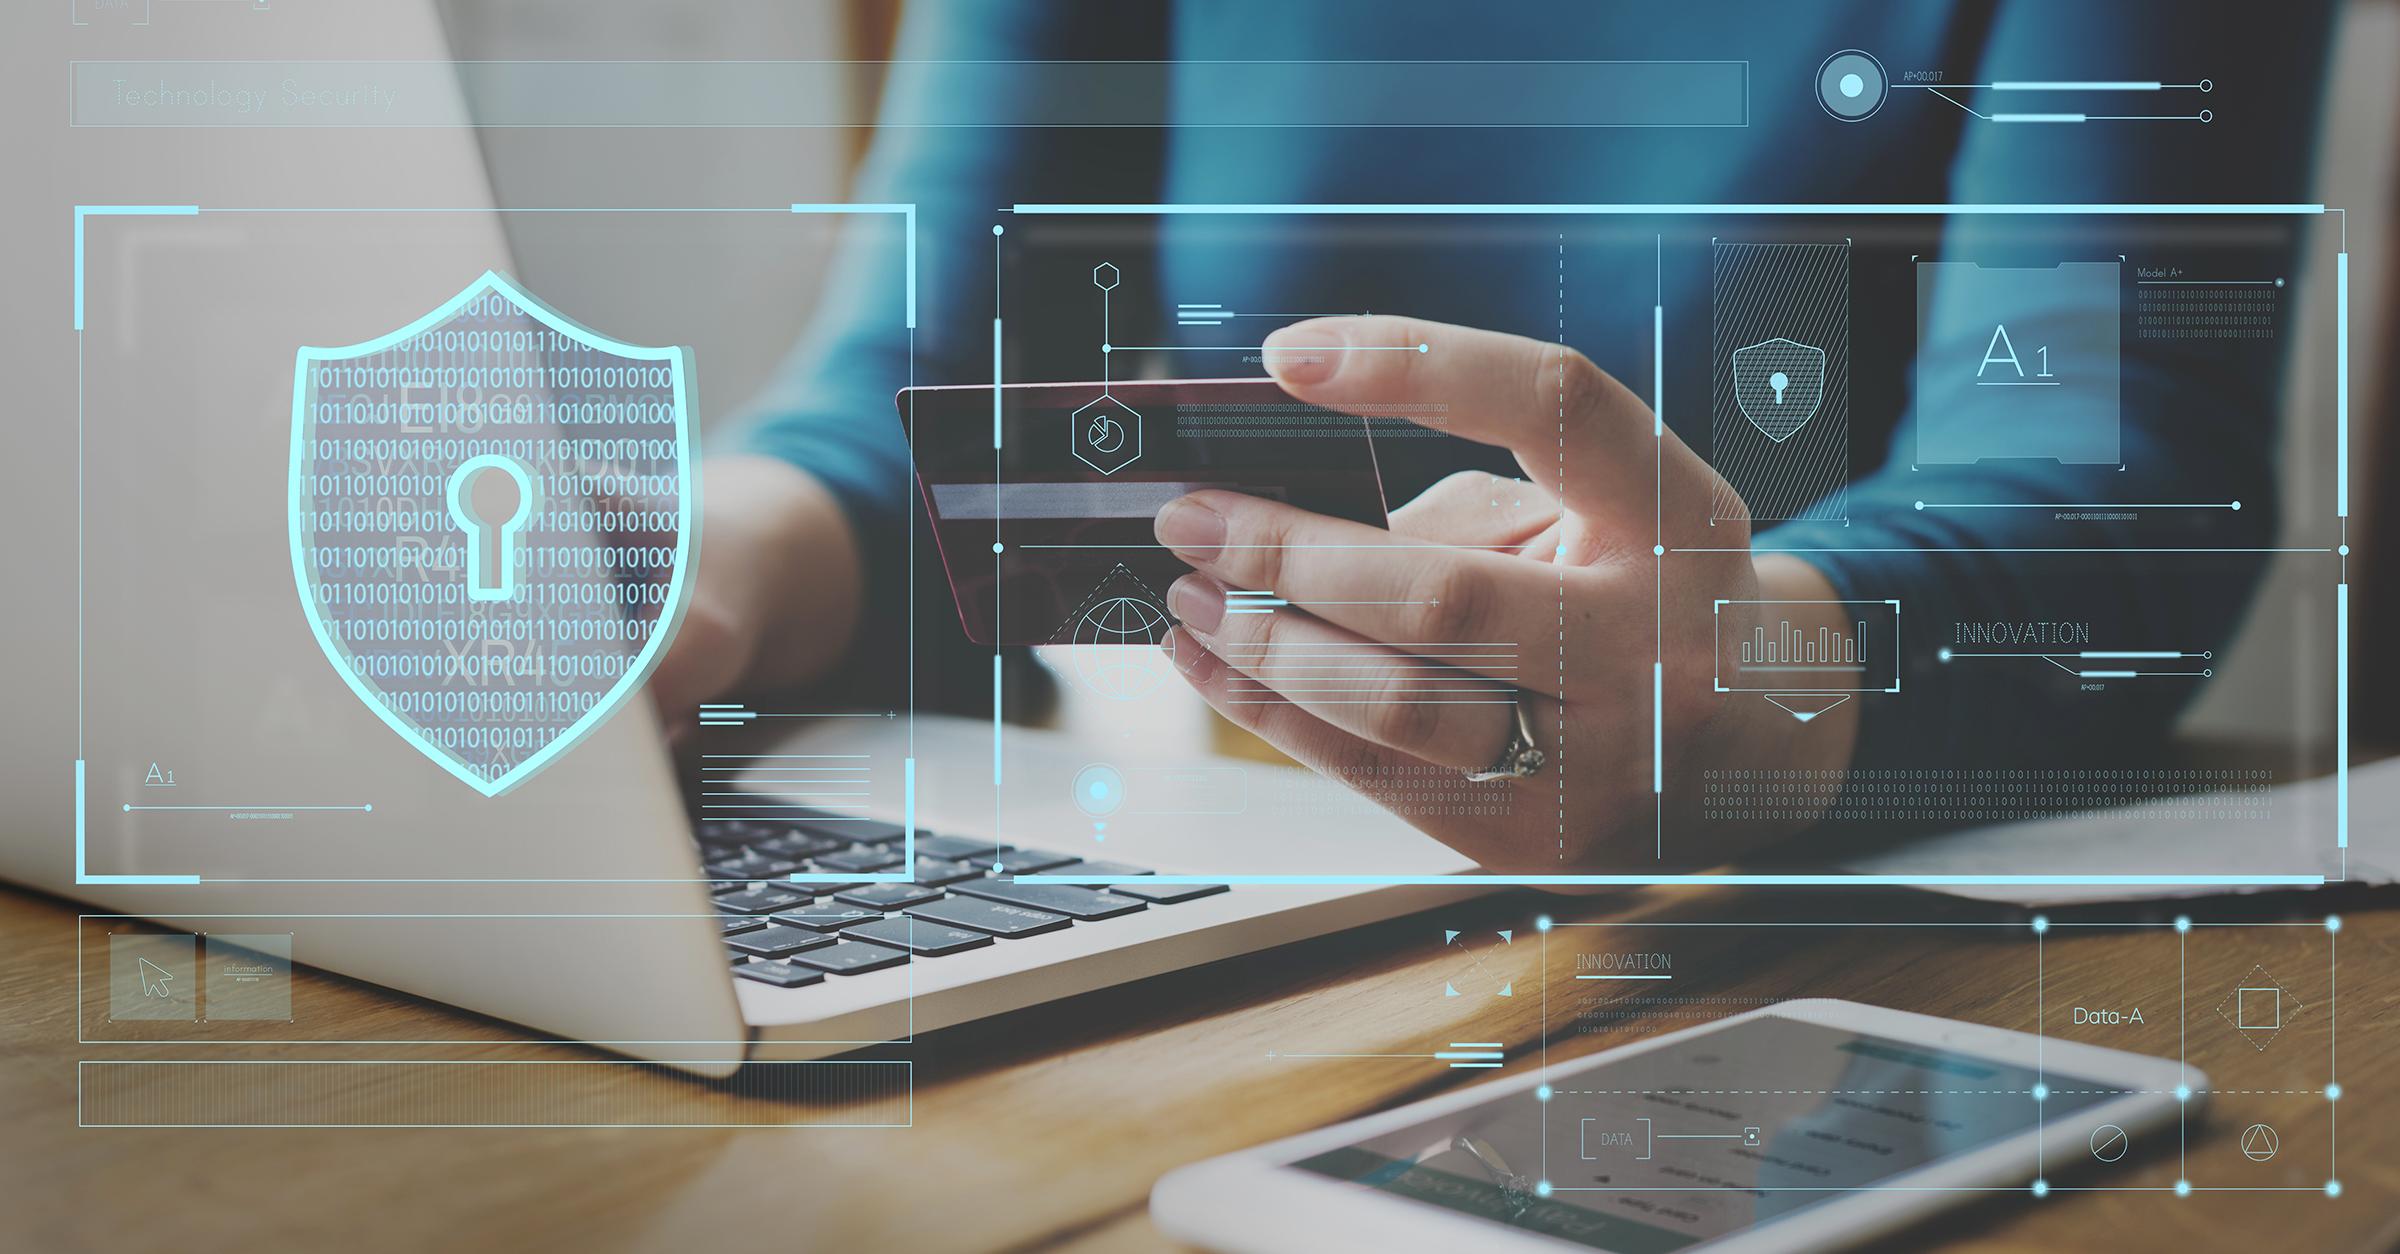 Enhancing identity verification with AI